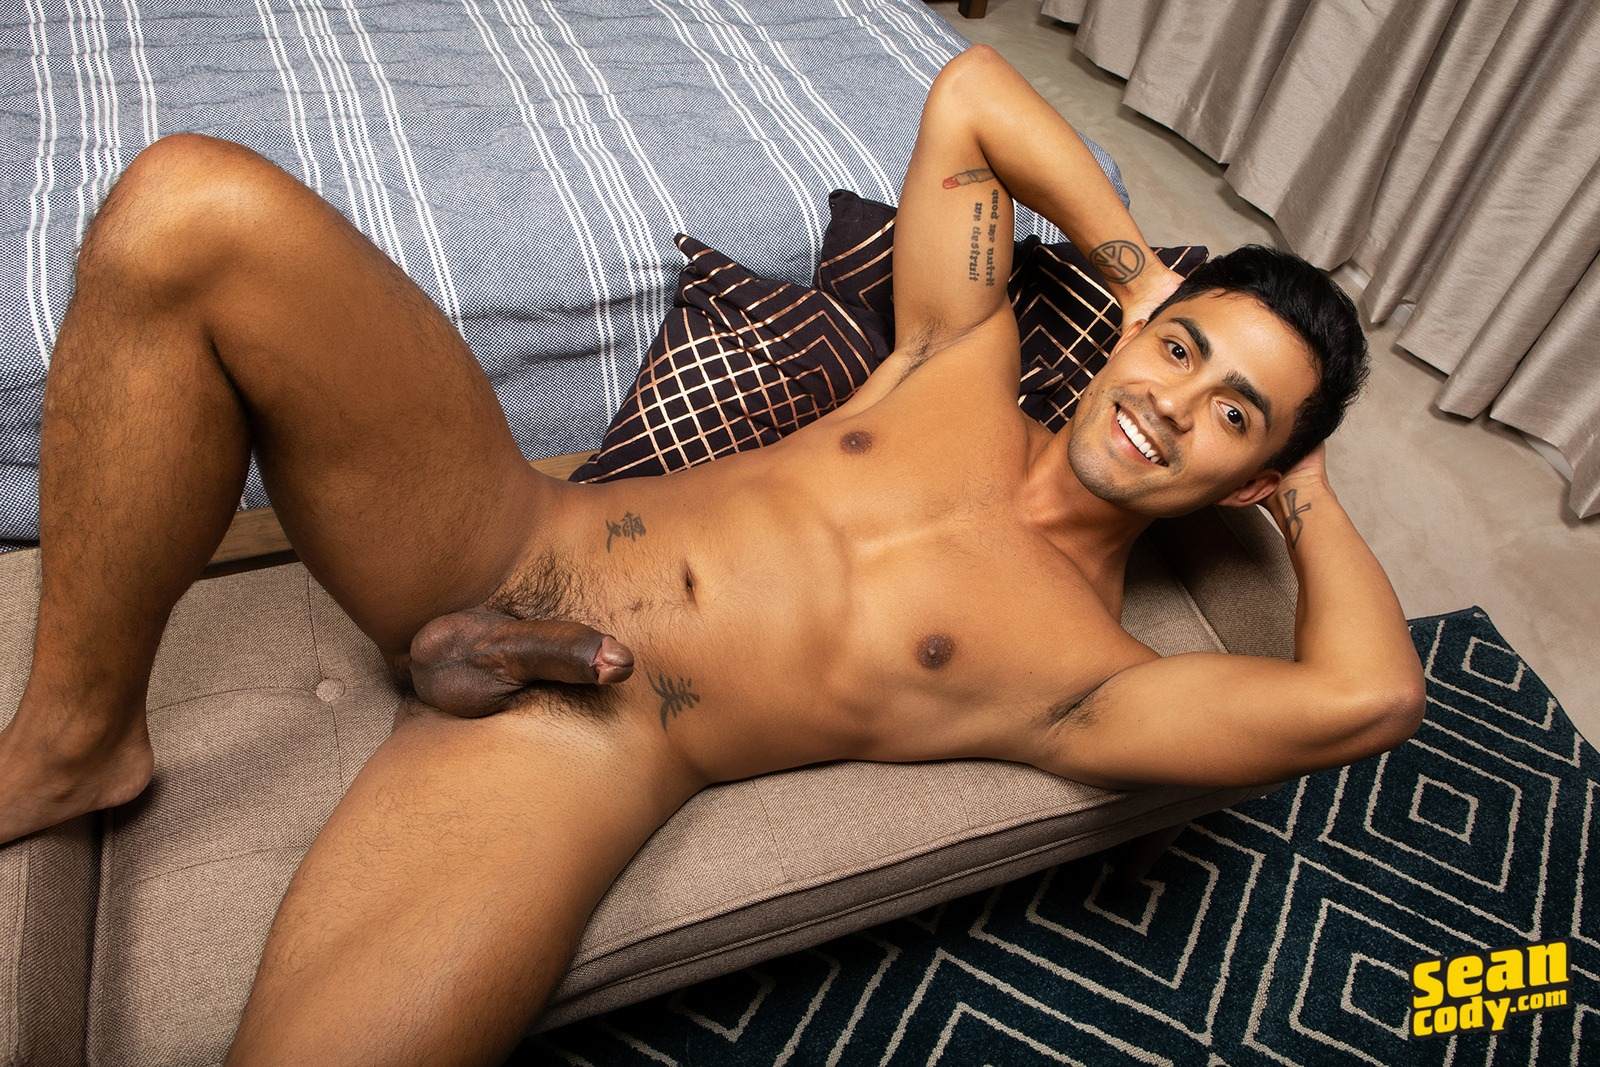 American studs making bareback gay porn